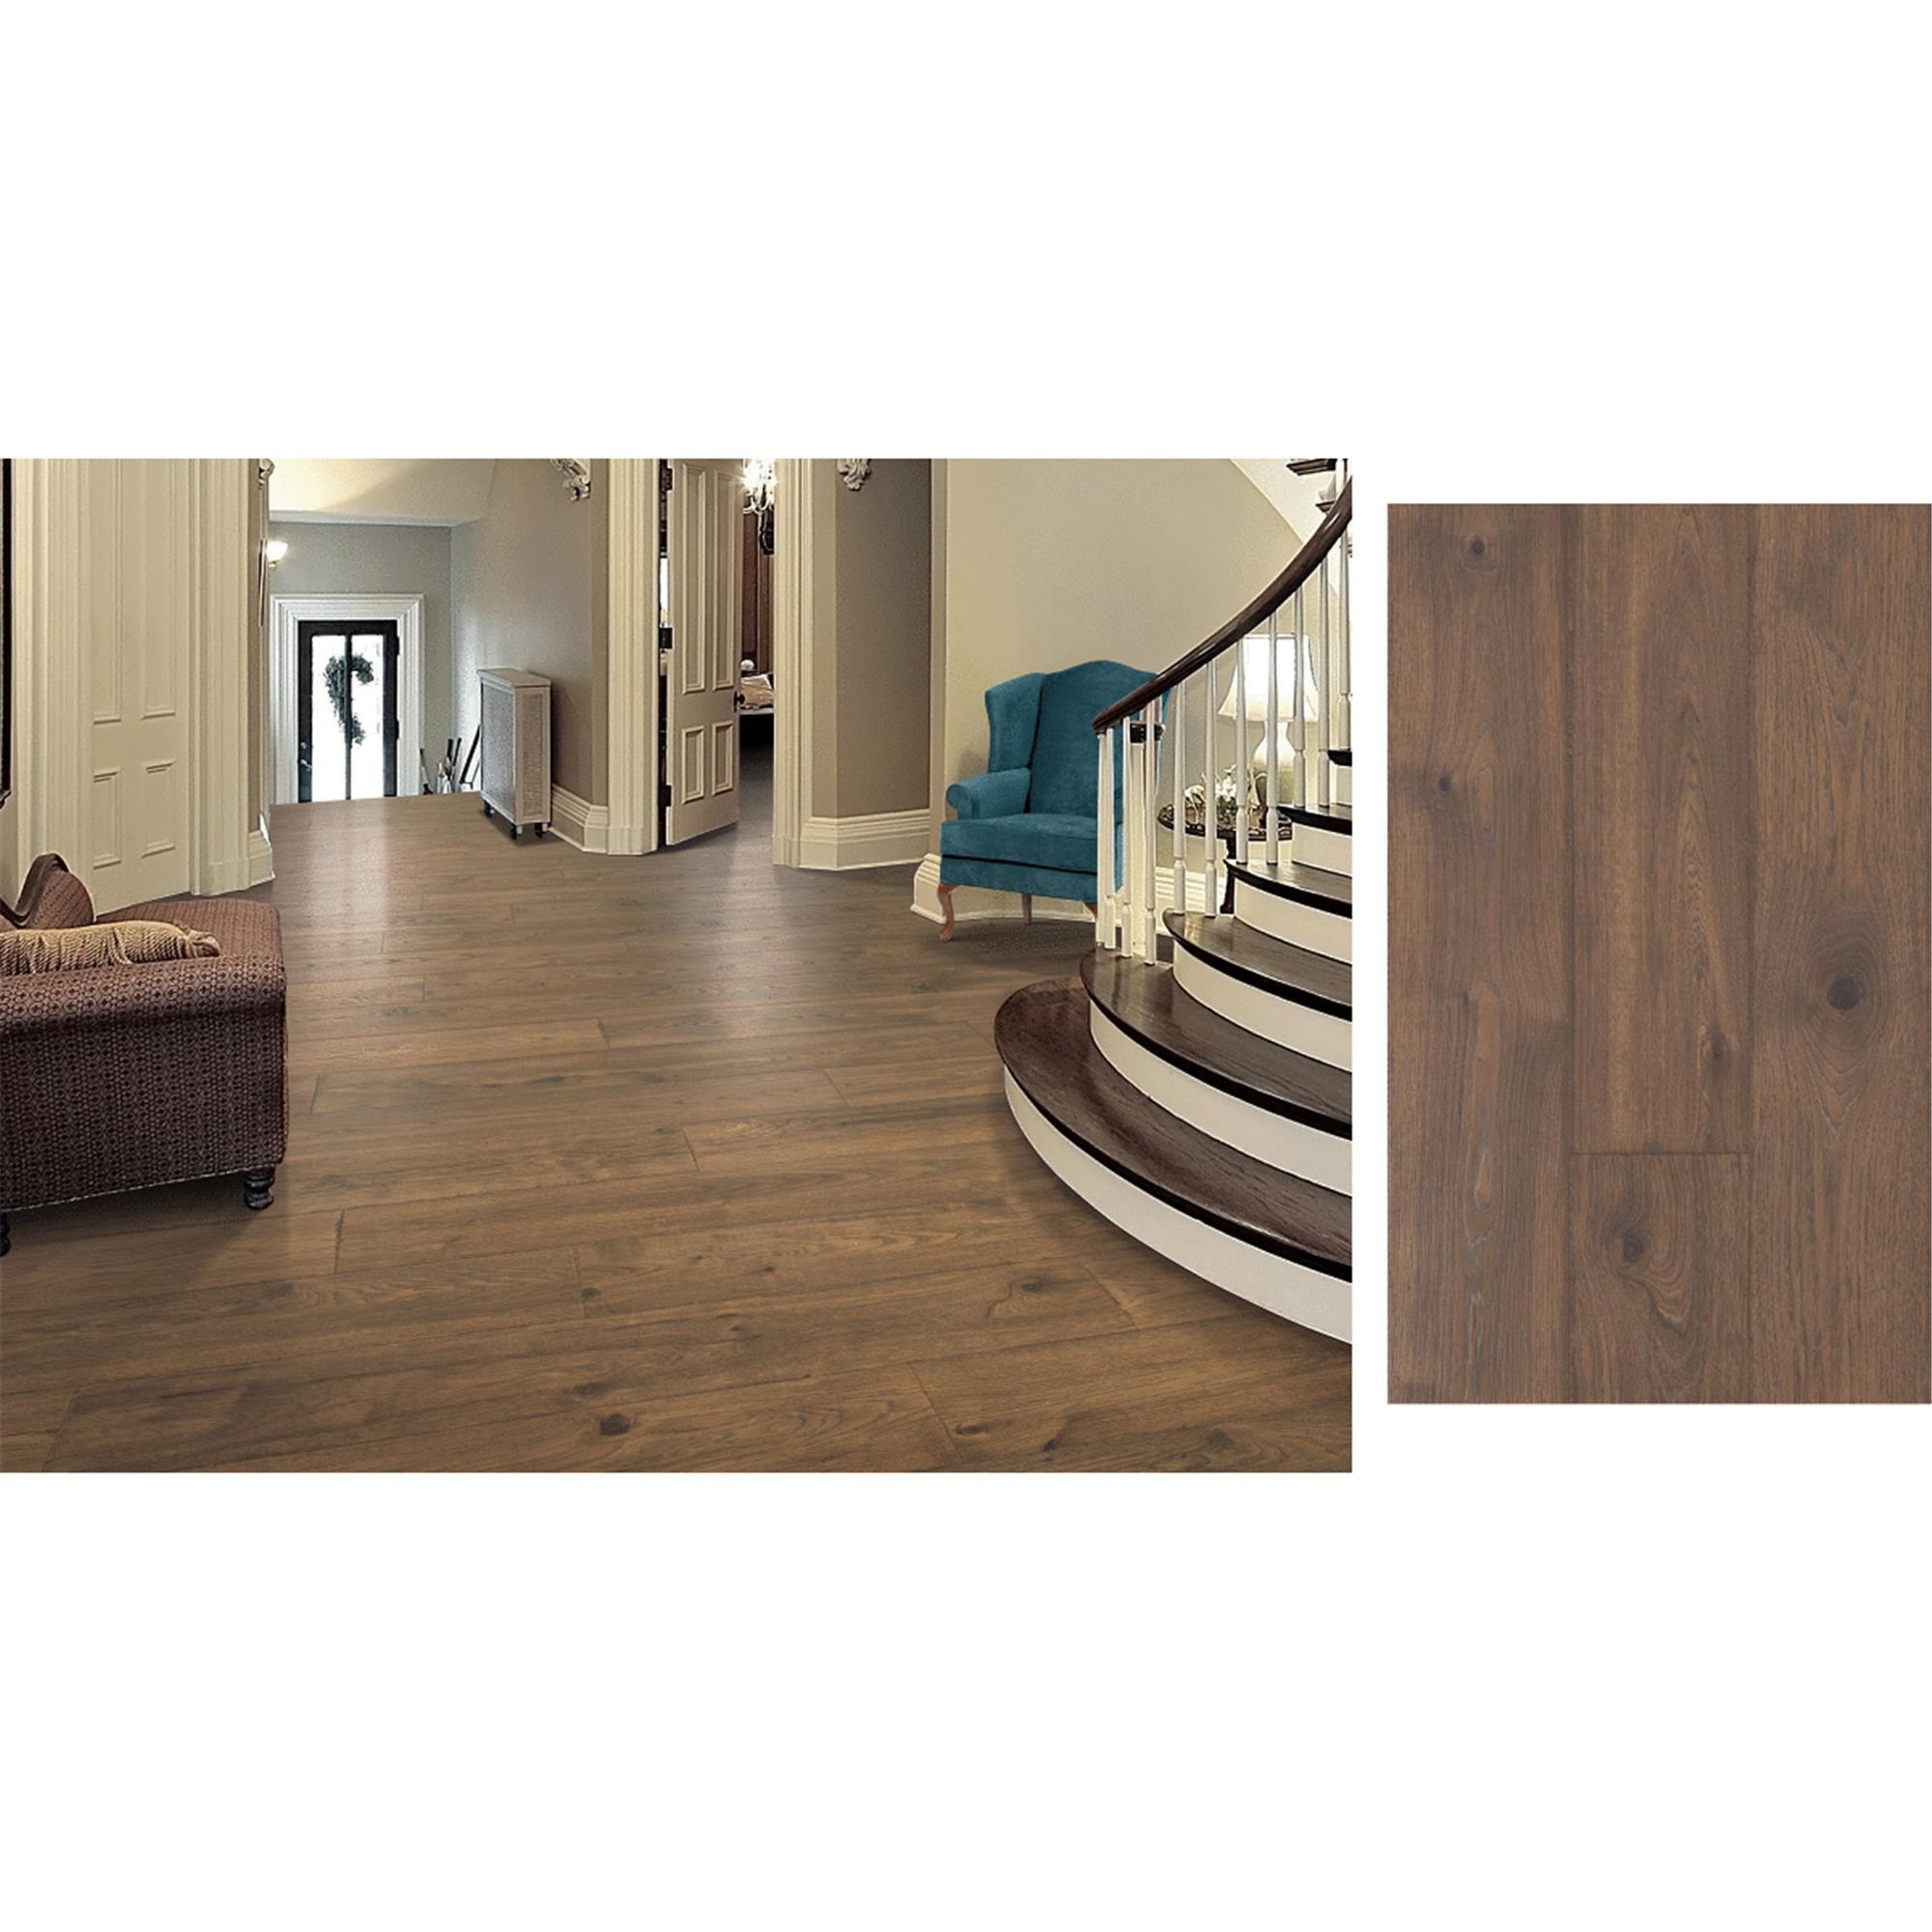 Mohawk 5 In 1 Multipurpose Laminate, Mohawk Laminate Flooring Transitions